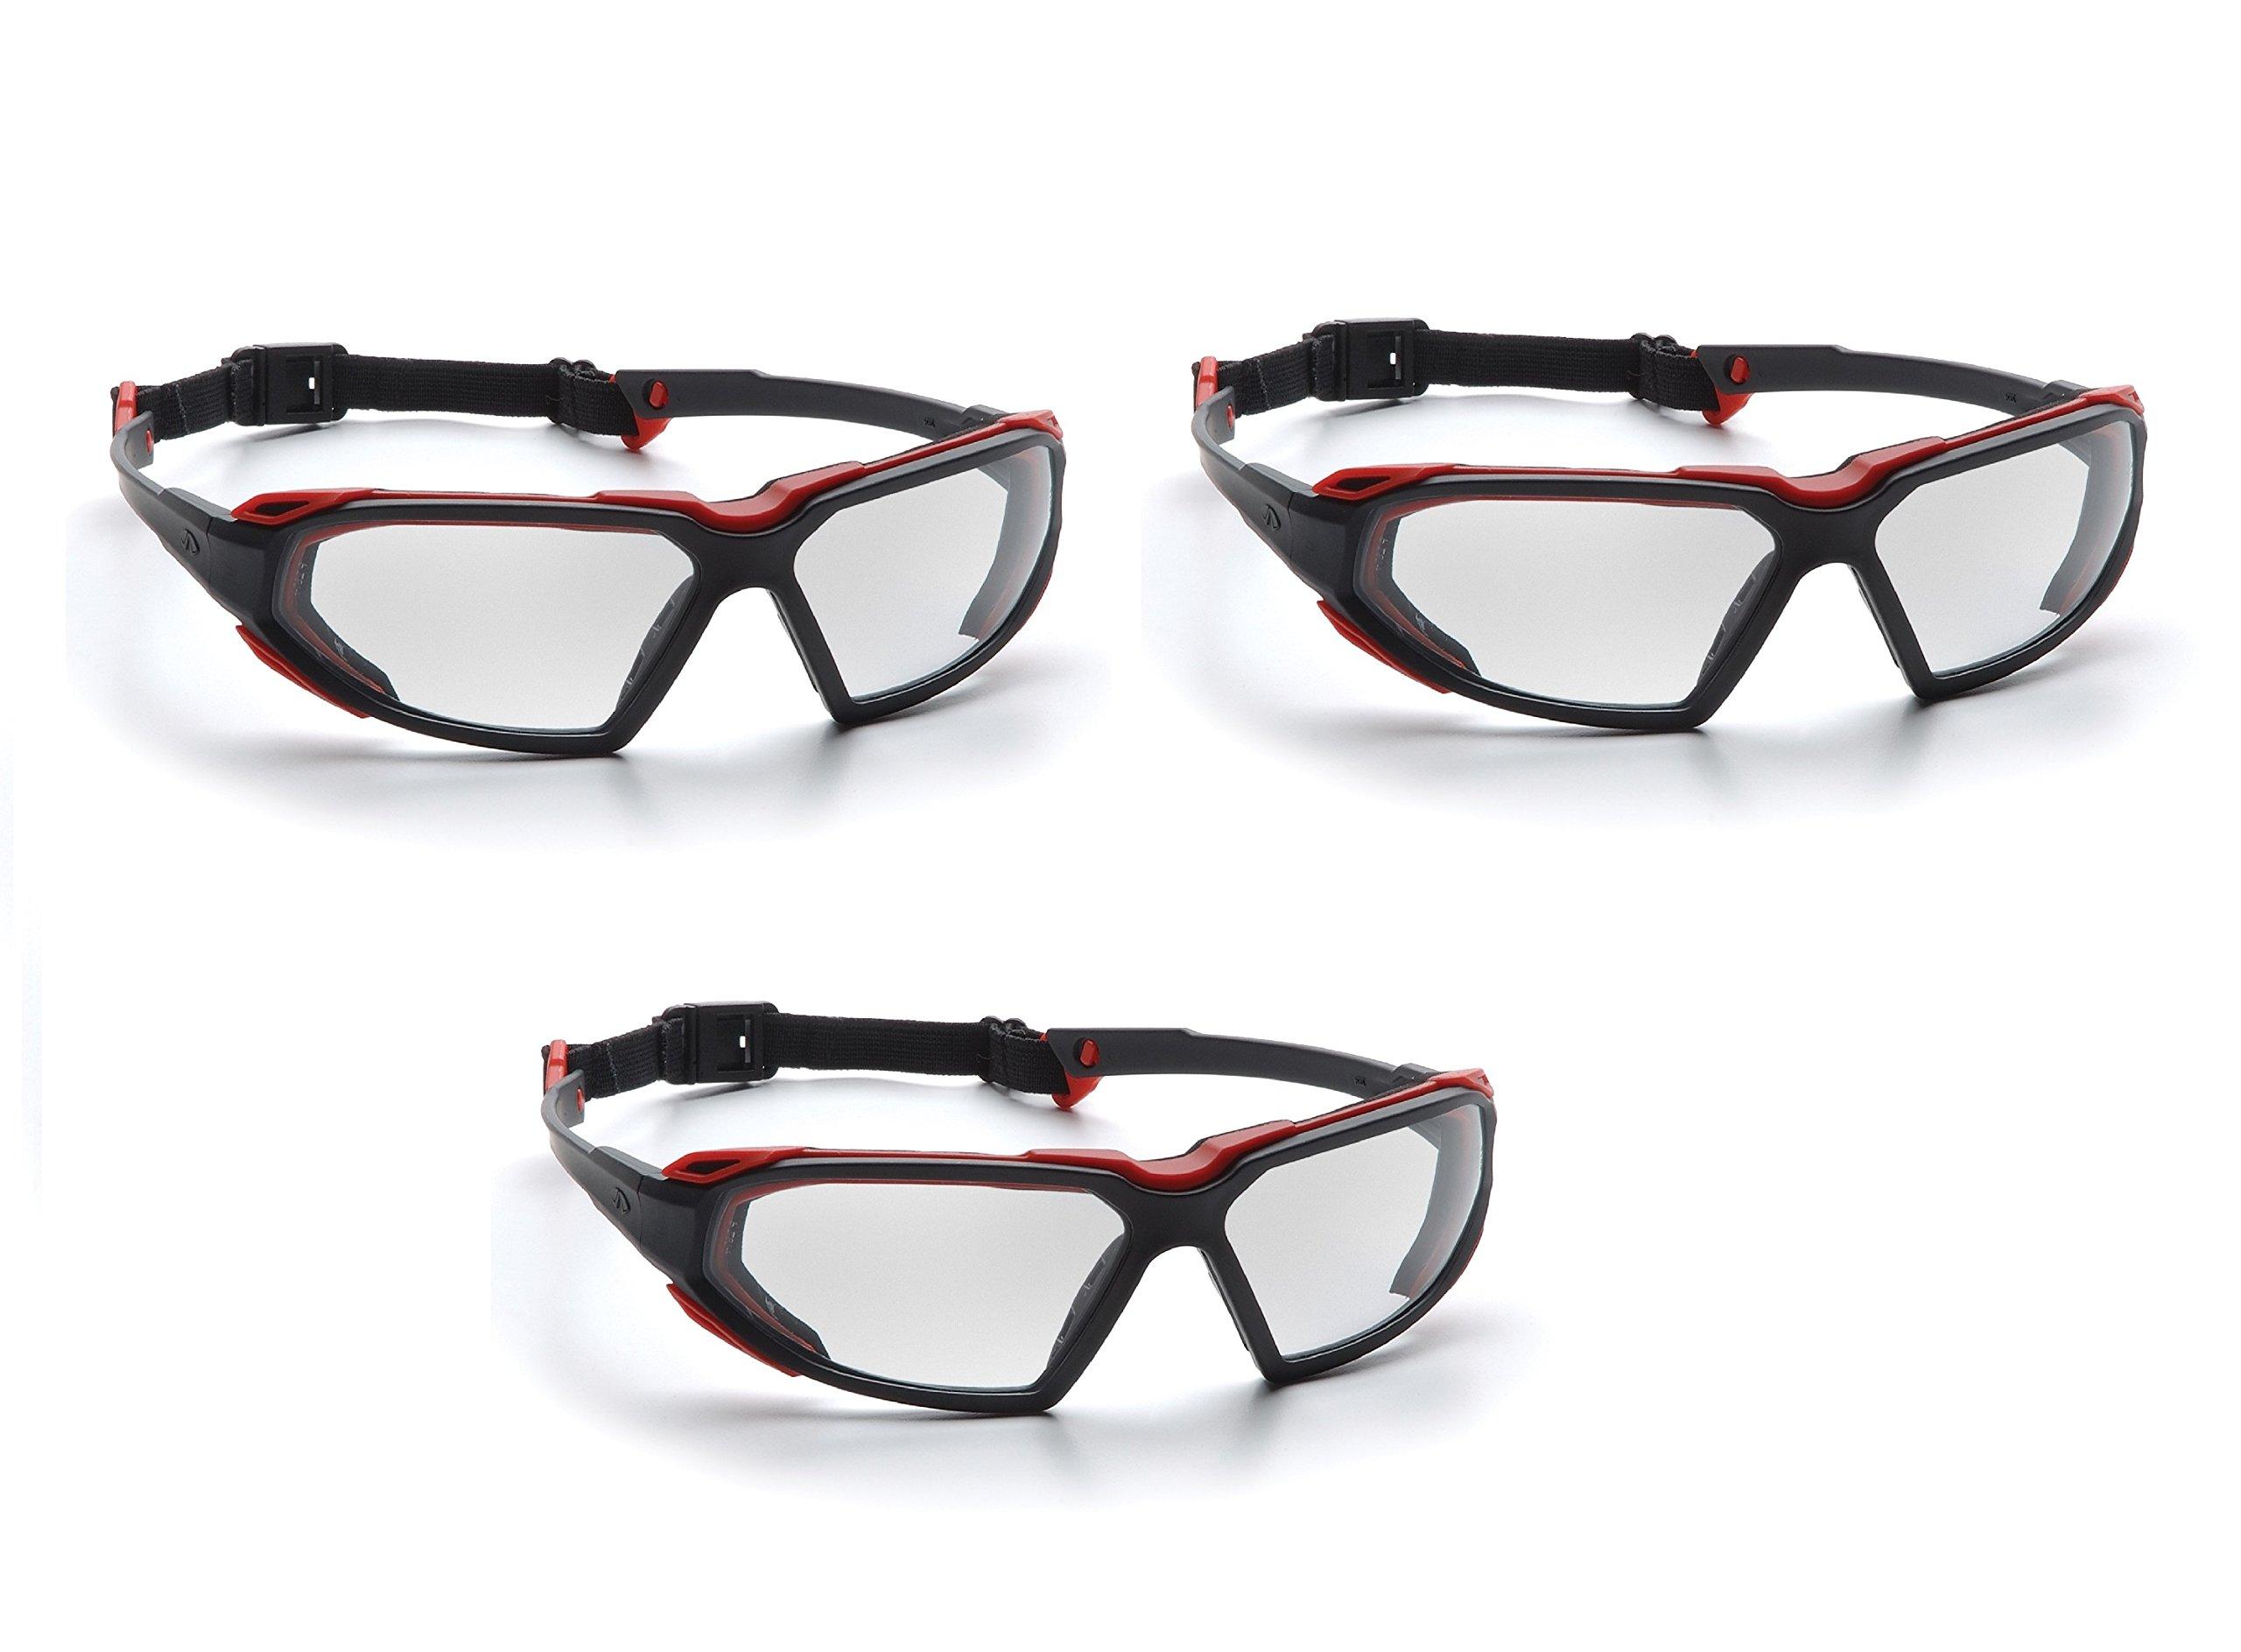 Highlander Pyramex Safety Eyewear (Black-Red Frame/Clear Anti-Fog Lens) (3 Pair Pack) by Highlander